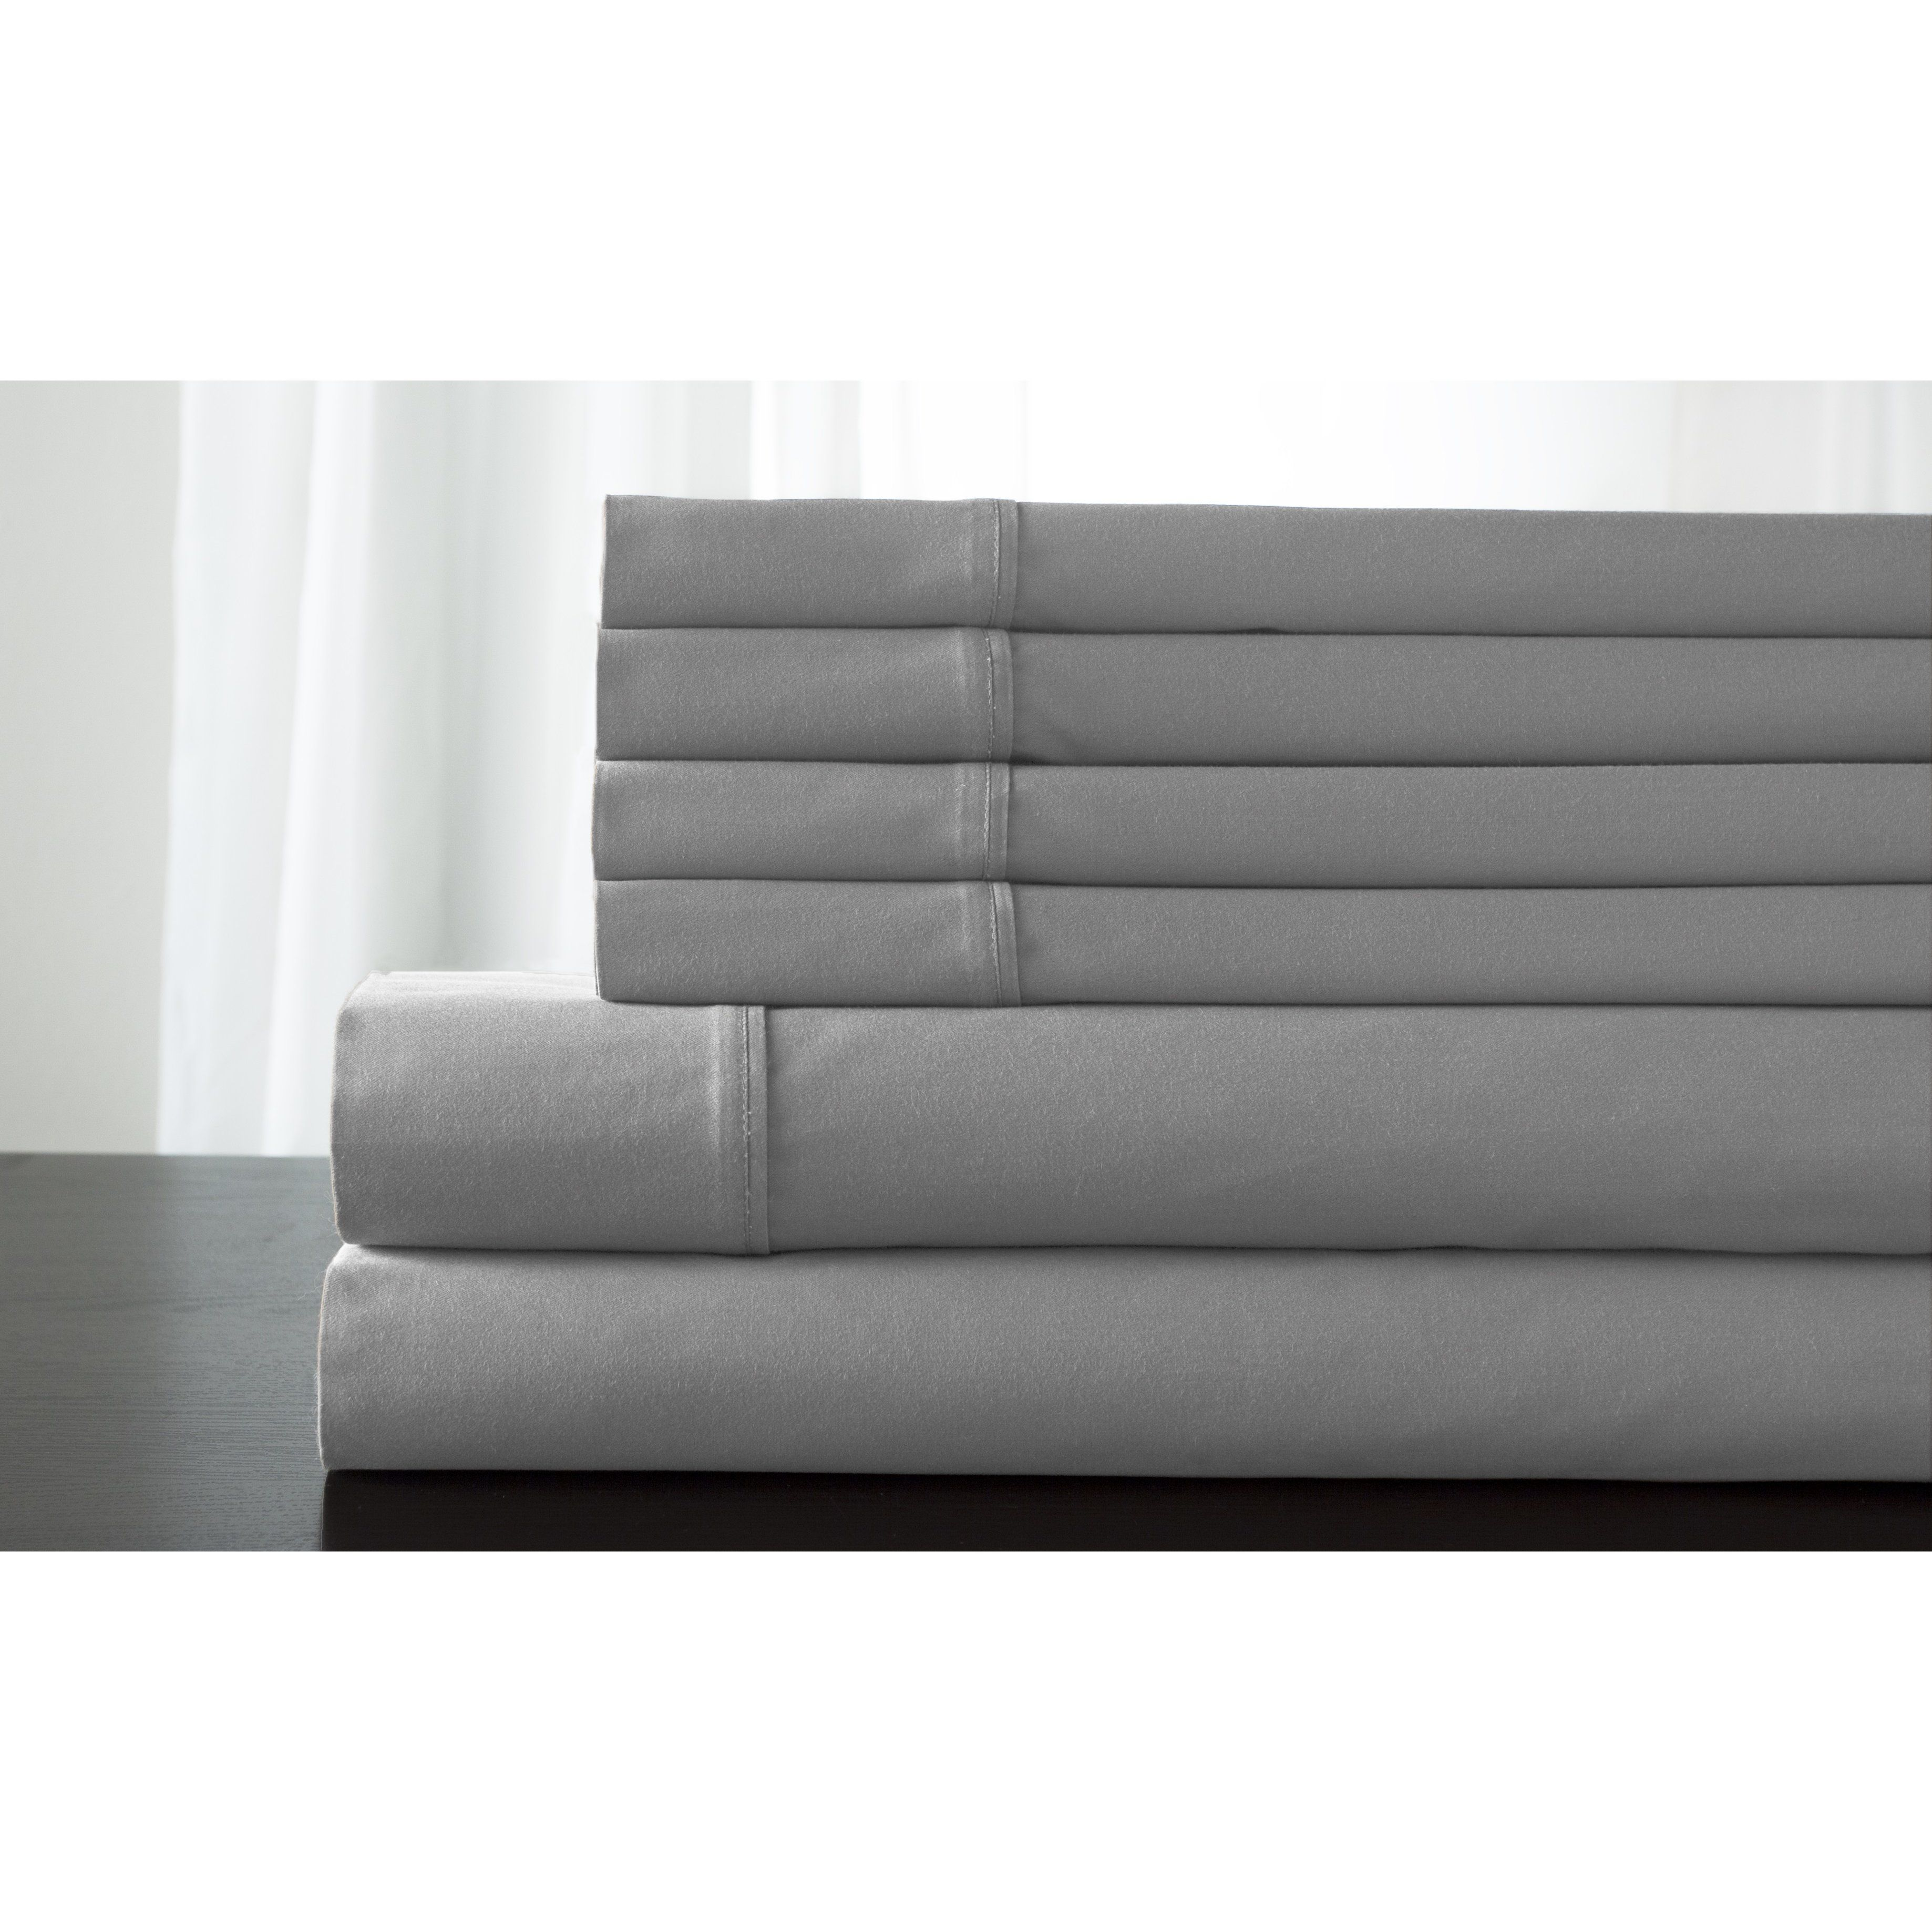 Customer Image Zoomed Bedding